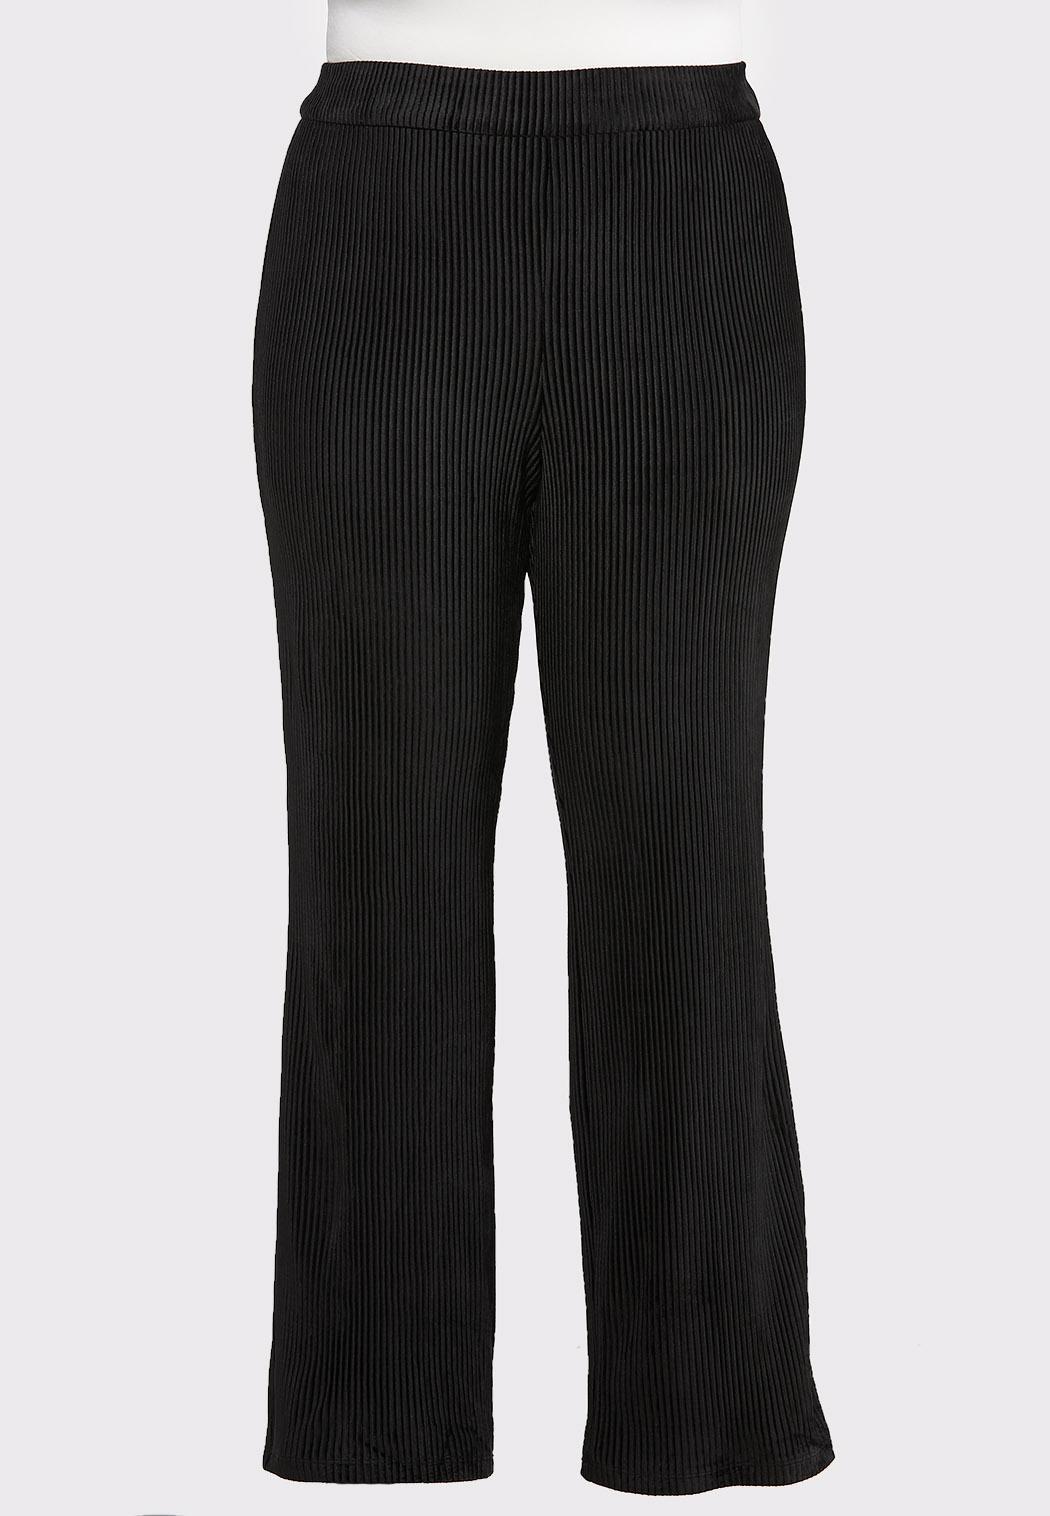 Plus Size Flare Leg Corduroy Pants Pants Cato Fashions